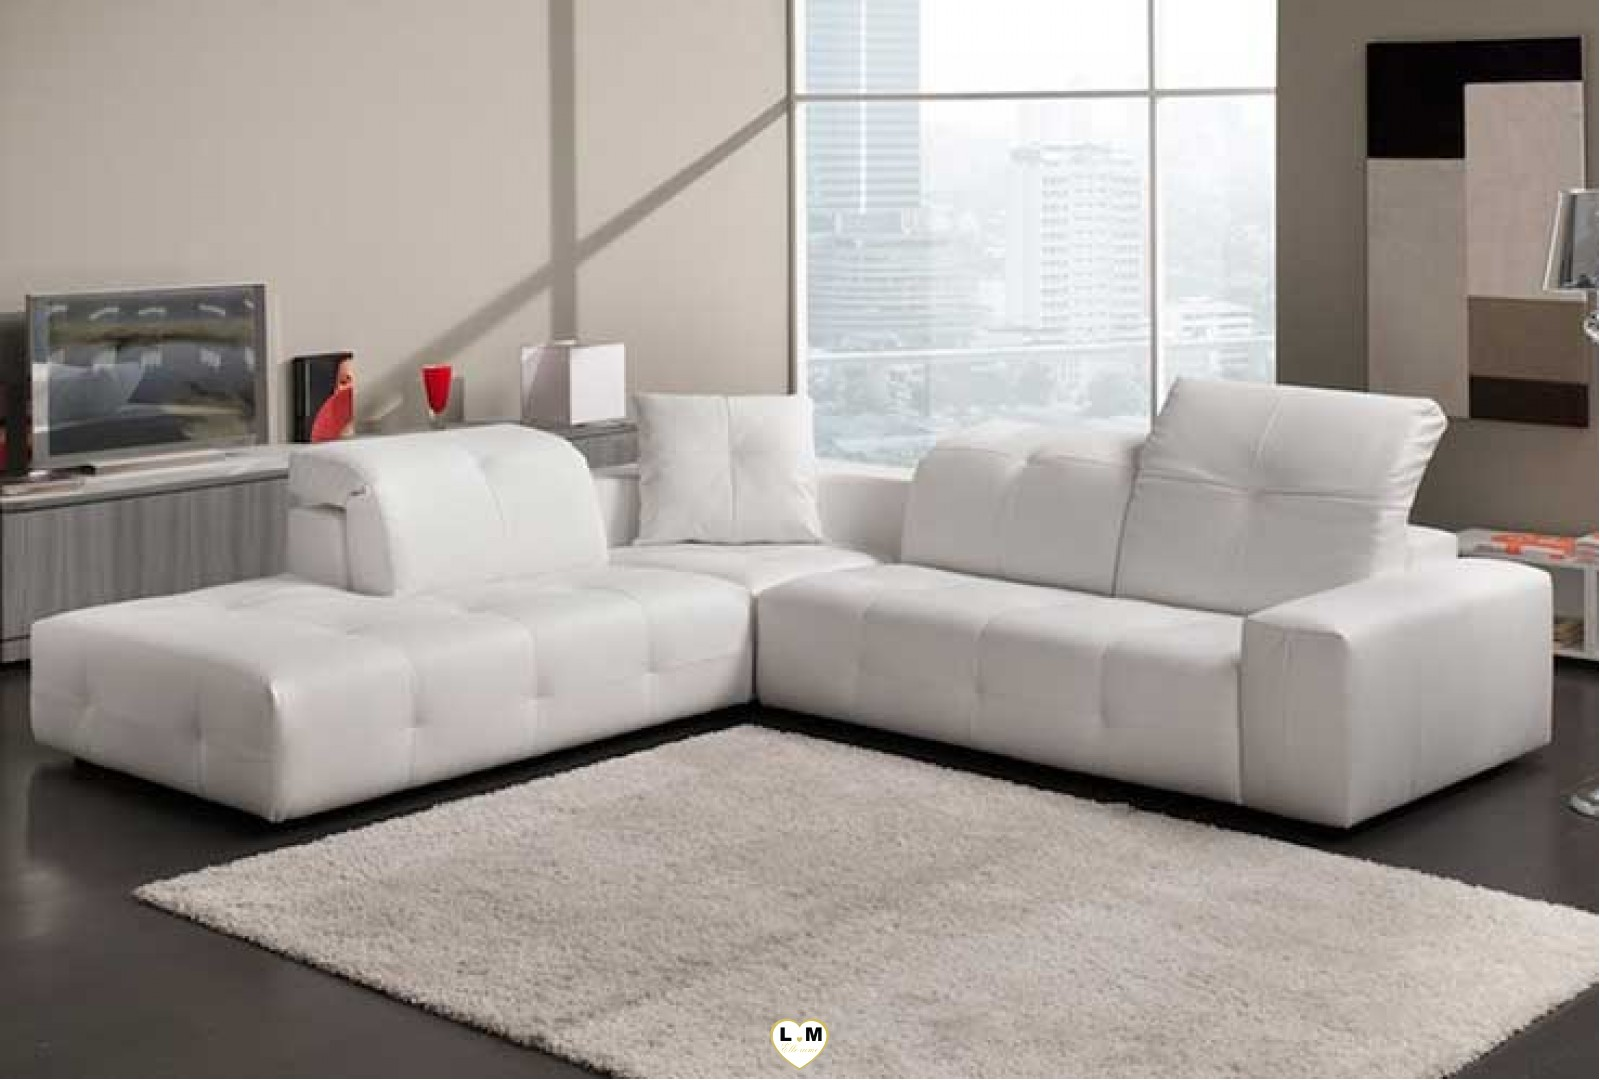 cecile angle ensemble salon cuir lignemeuble com. Black Bedroom Furniture Sets. Home Design Ideas